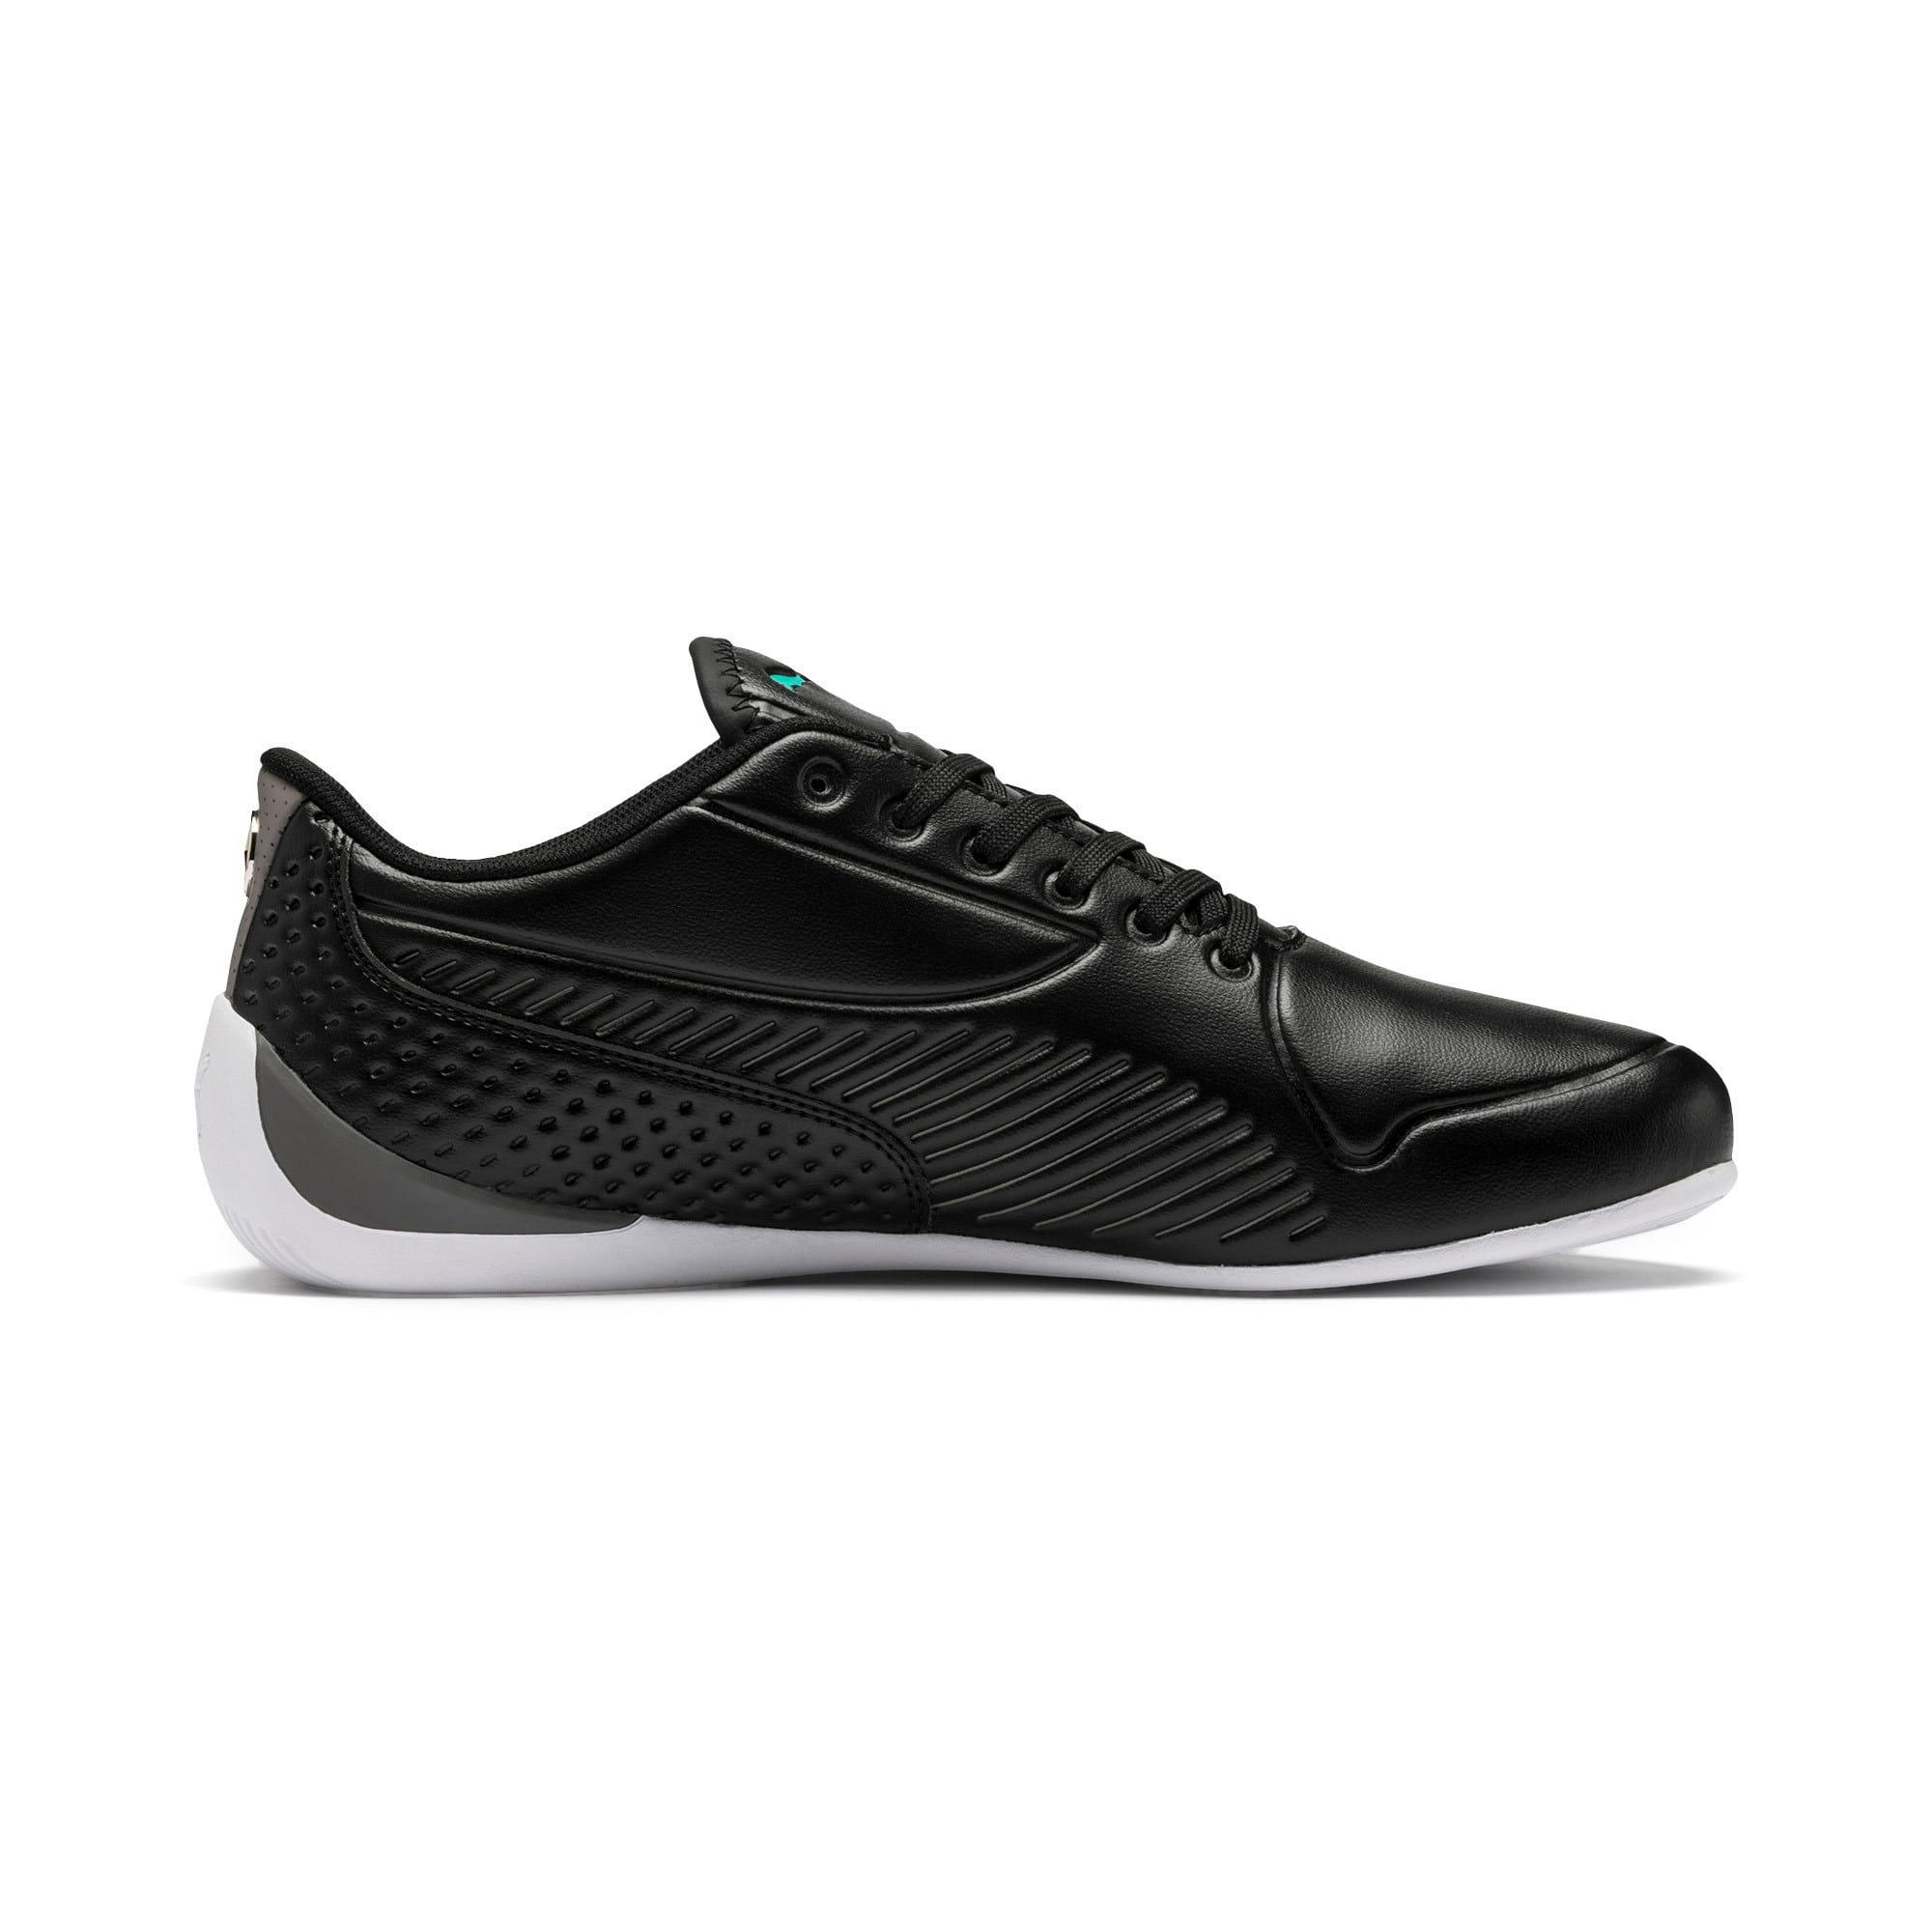 Thumbnail 6 of Mercedes AMG Petronas Drift Cat 7S Ultra Men's Shoes, Puma Black-Puma Black, medium